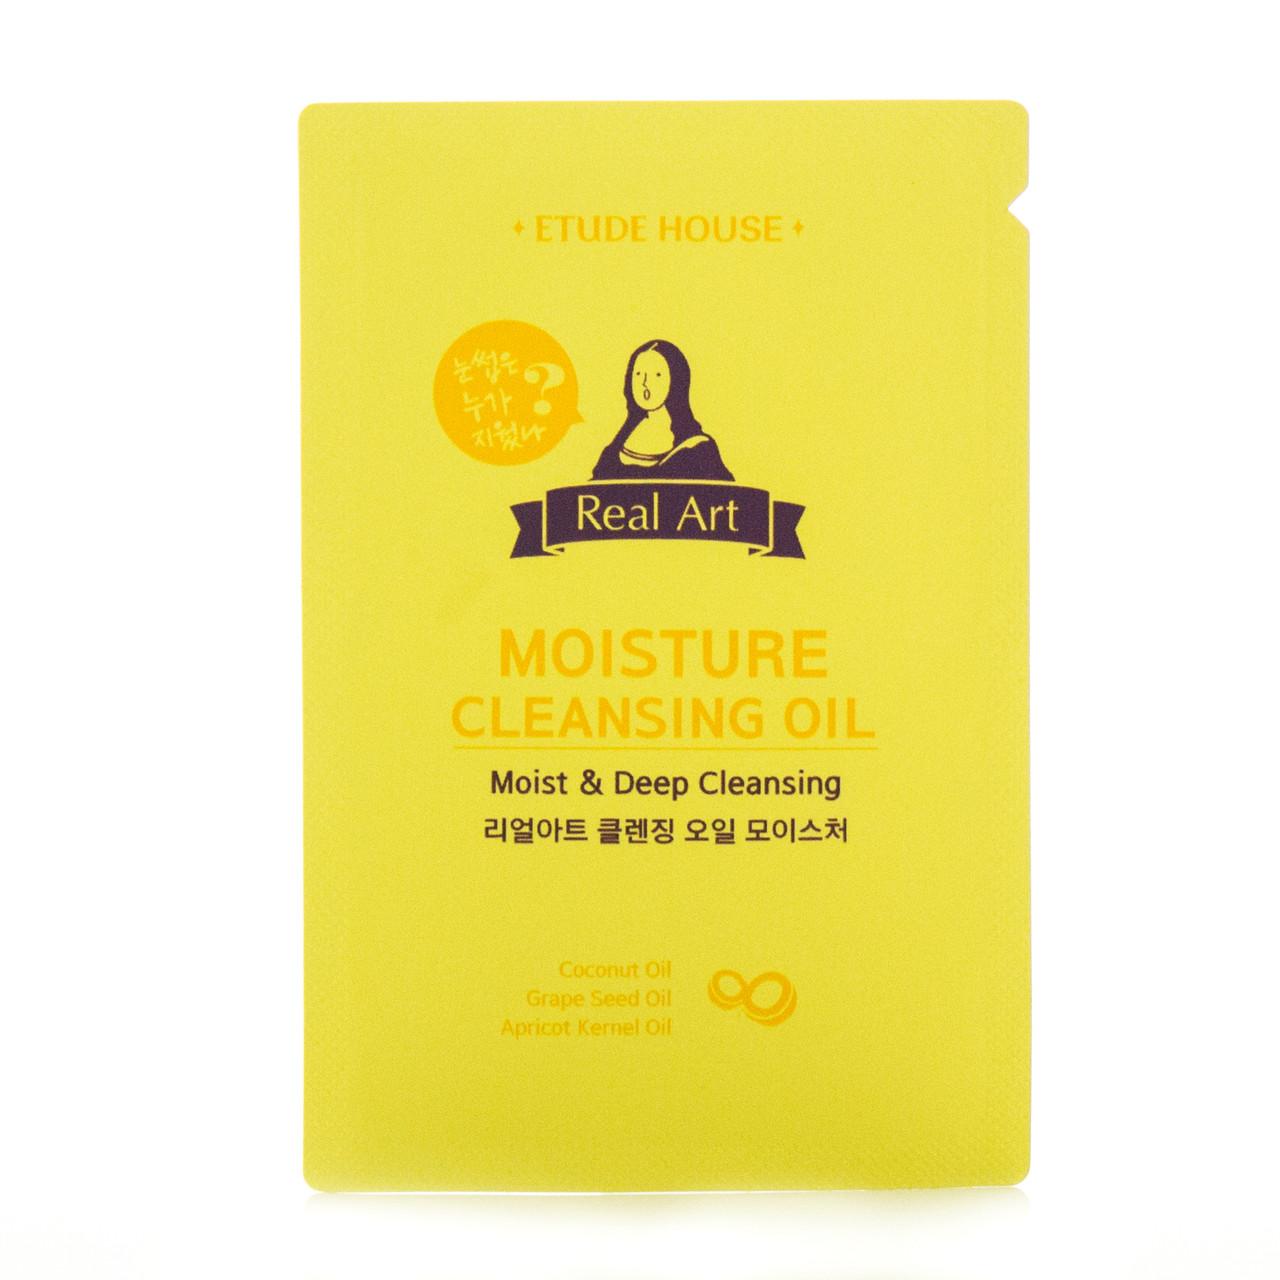 Гидрофильное масло для кожи лица Etude House Real Art Cleansing Oil Moisture 4 ml